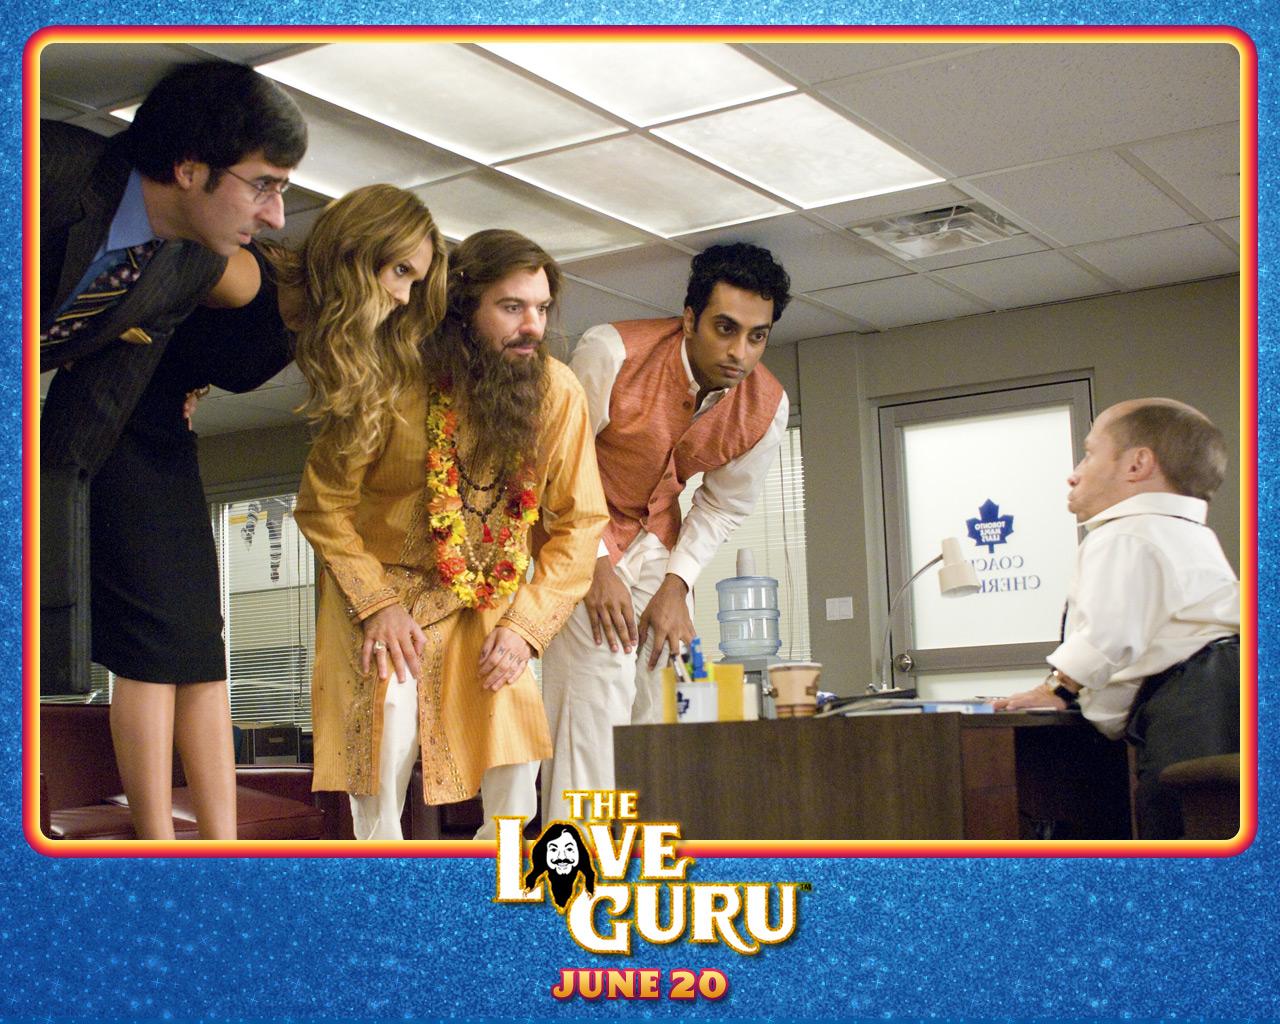 46827_The_Love_Guru_Wallpaper_003_122_104lo.jpg